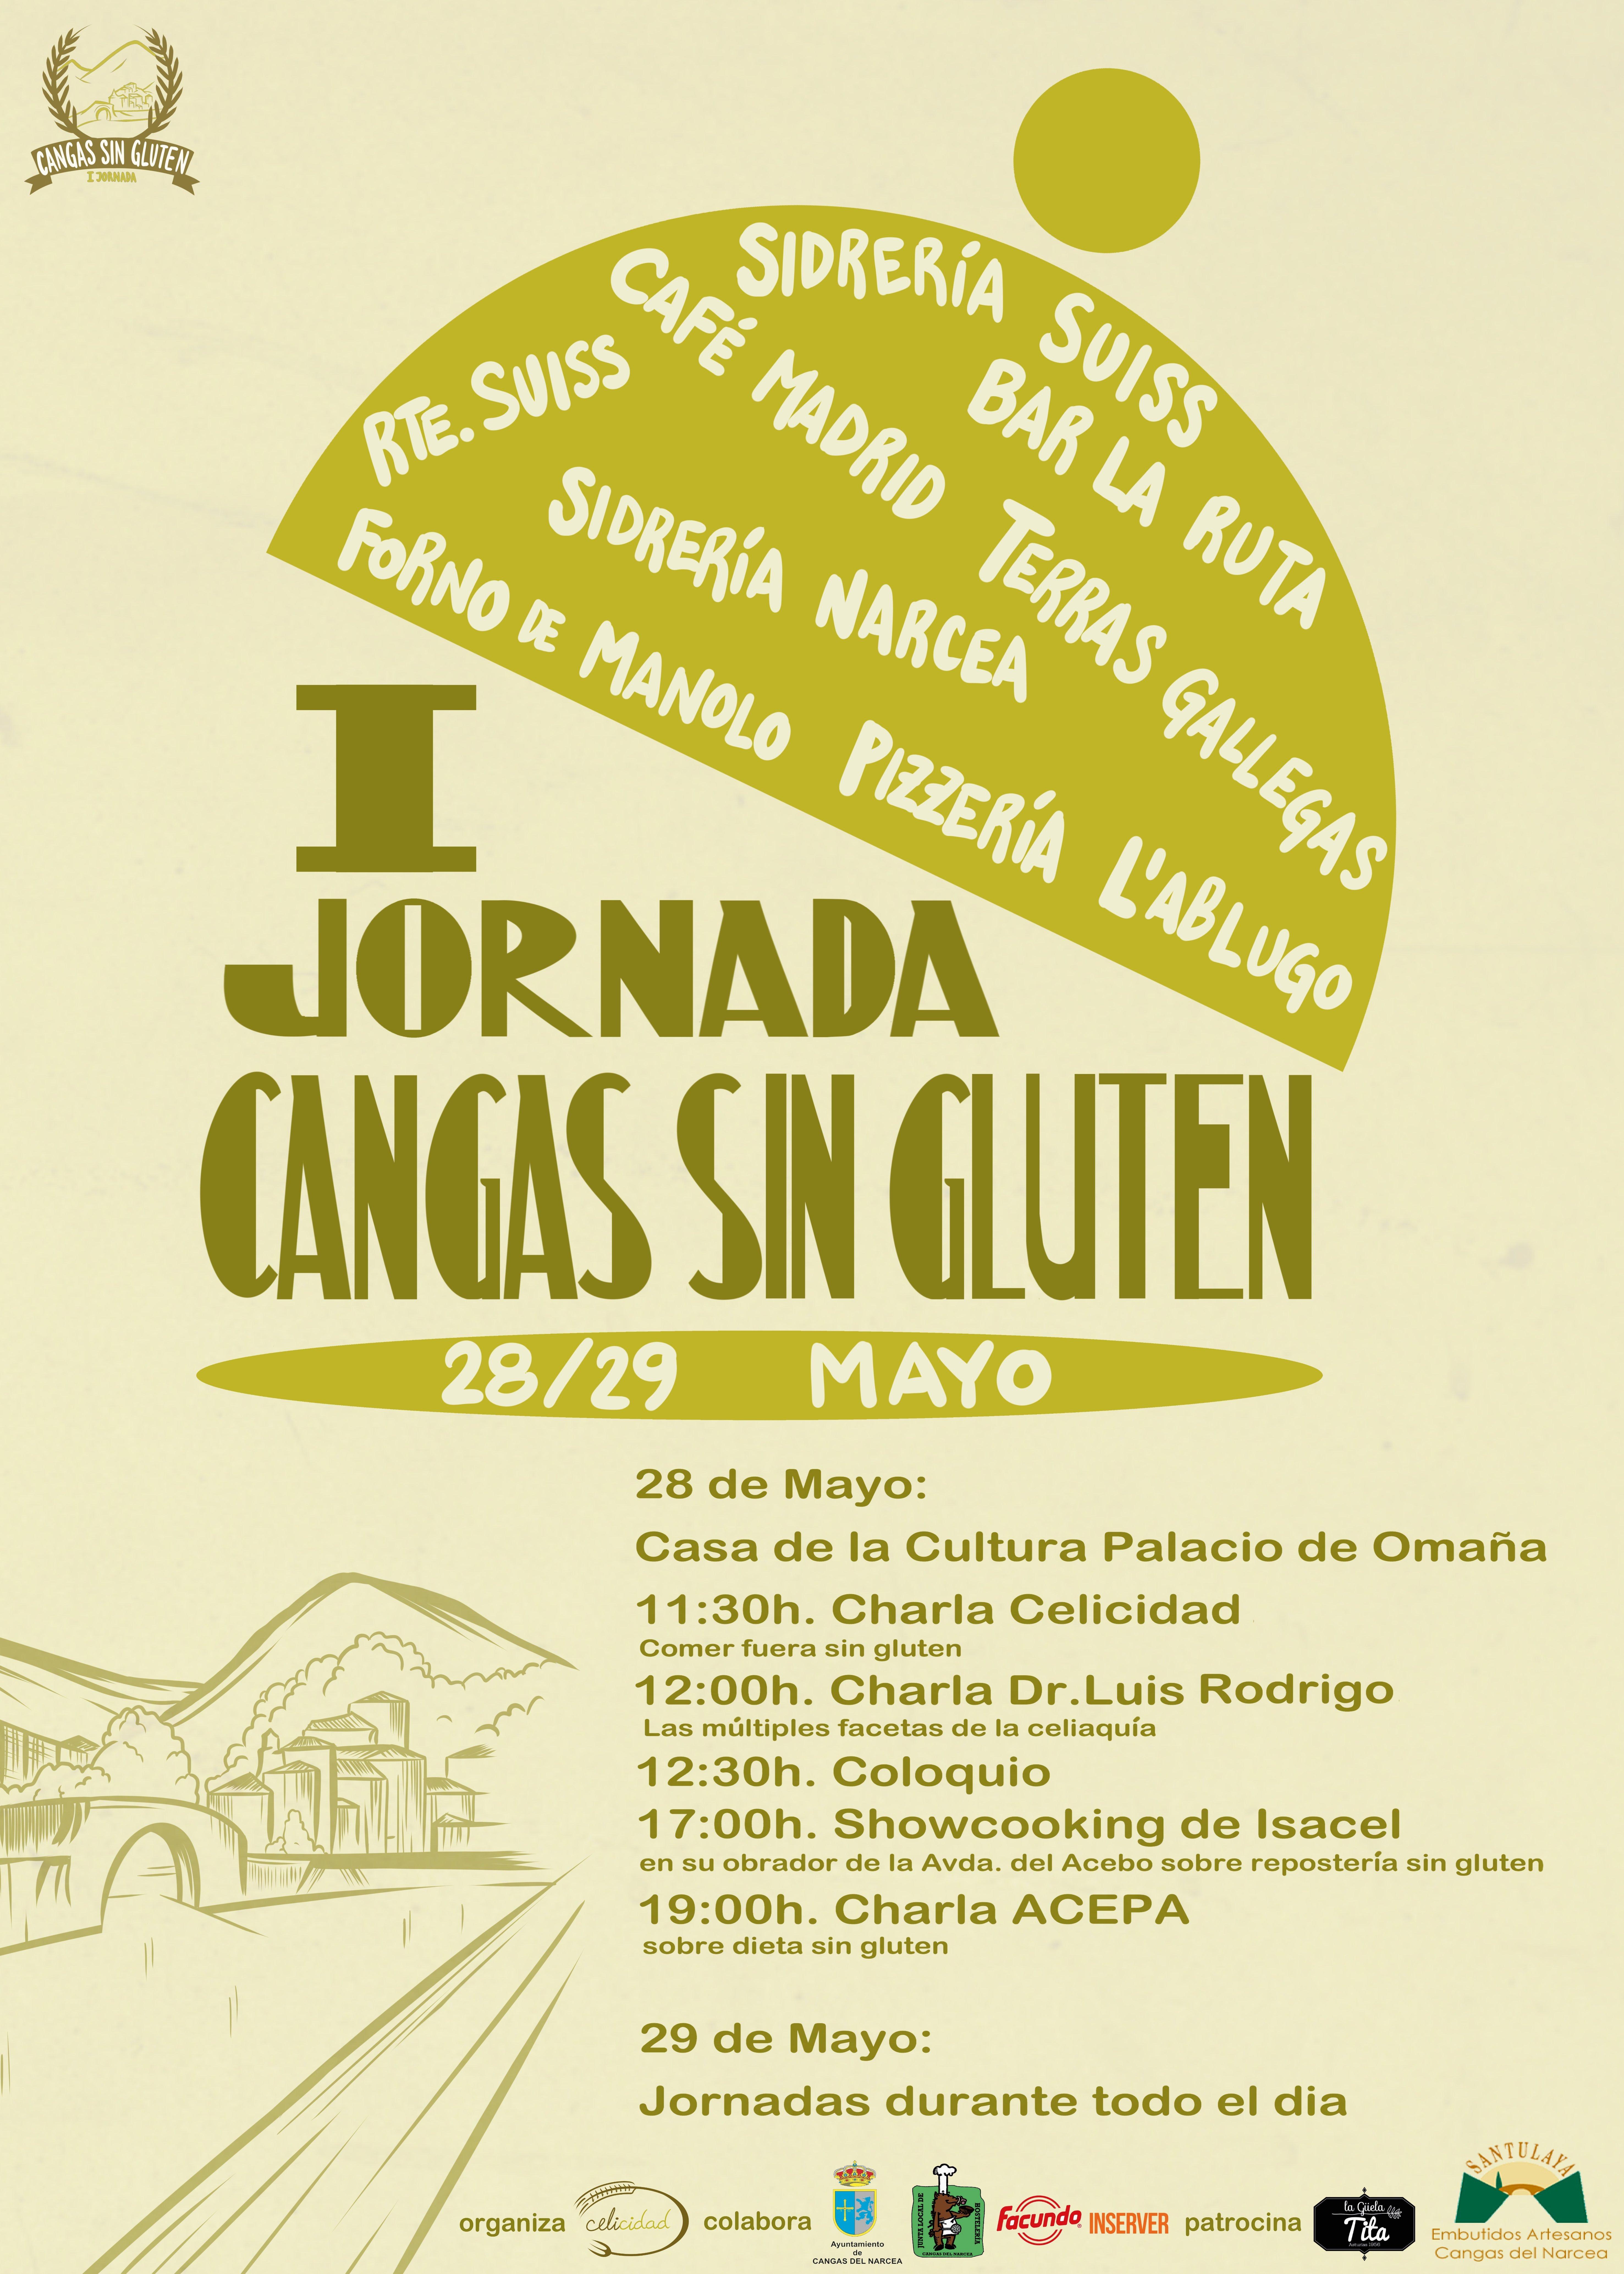 I Jornadas Cangas Sin Gluten.